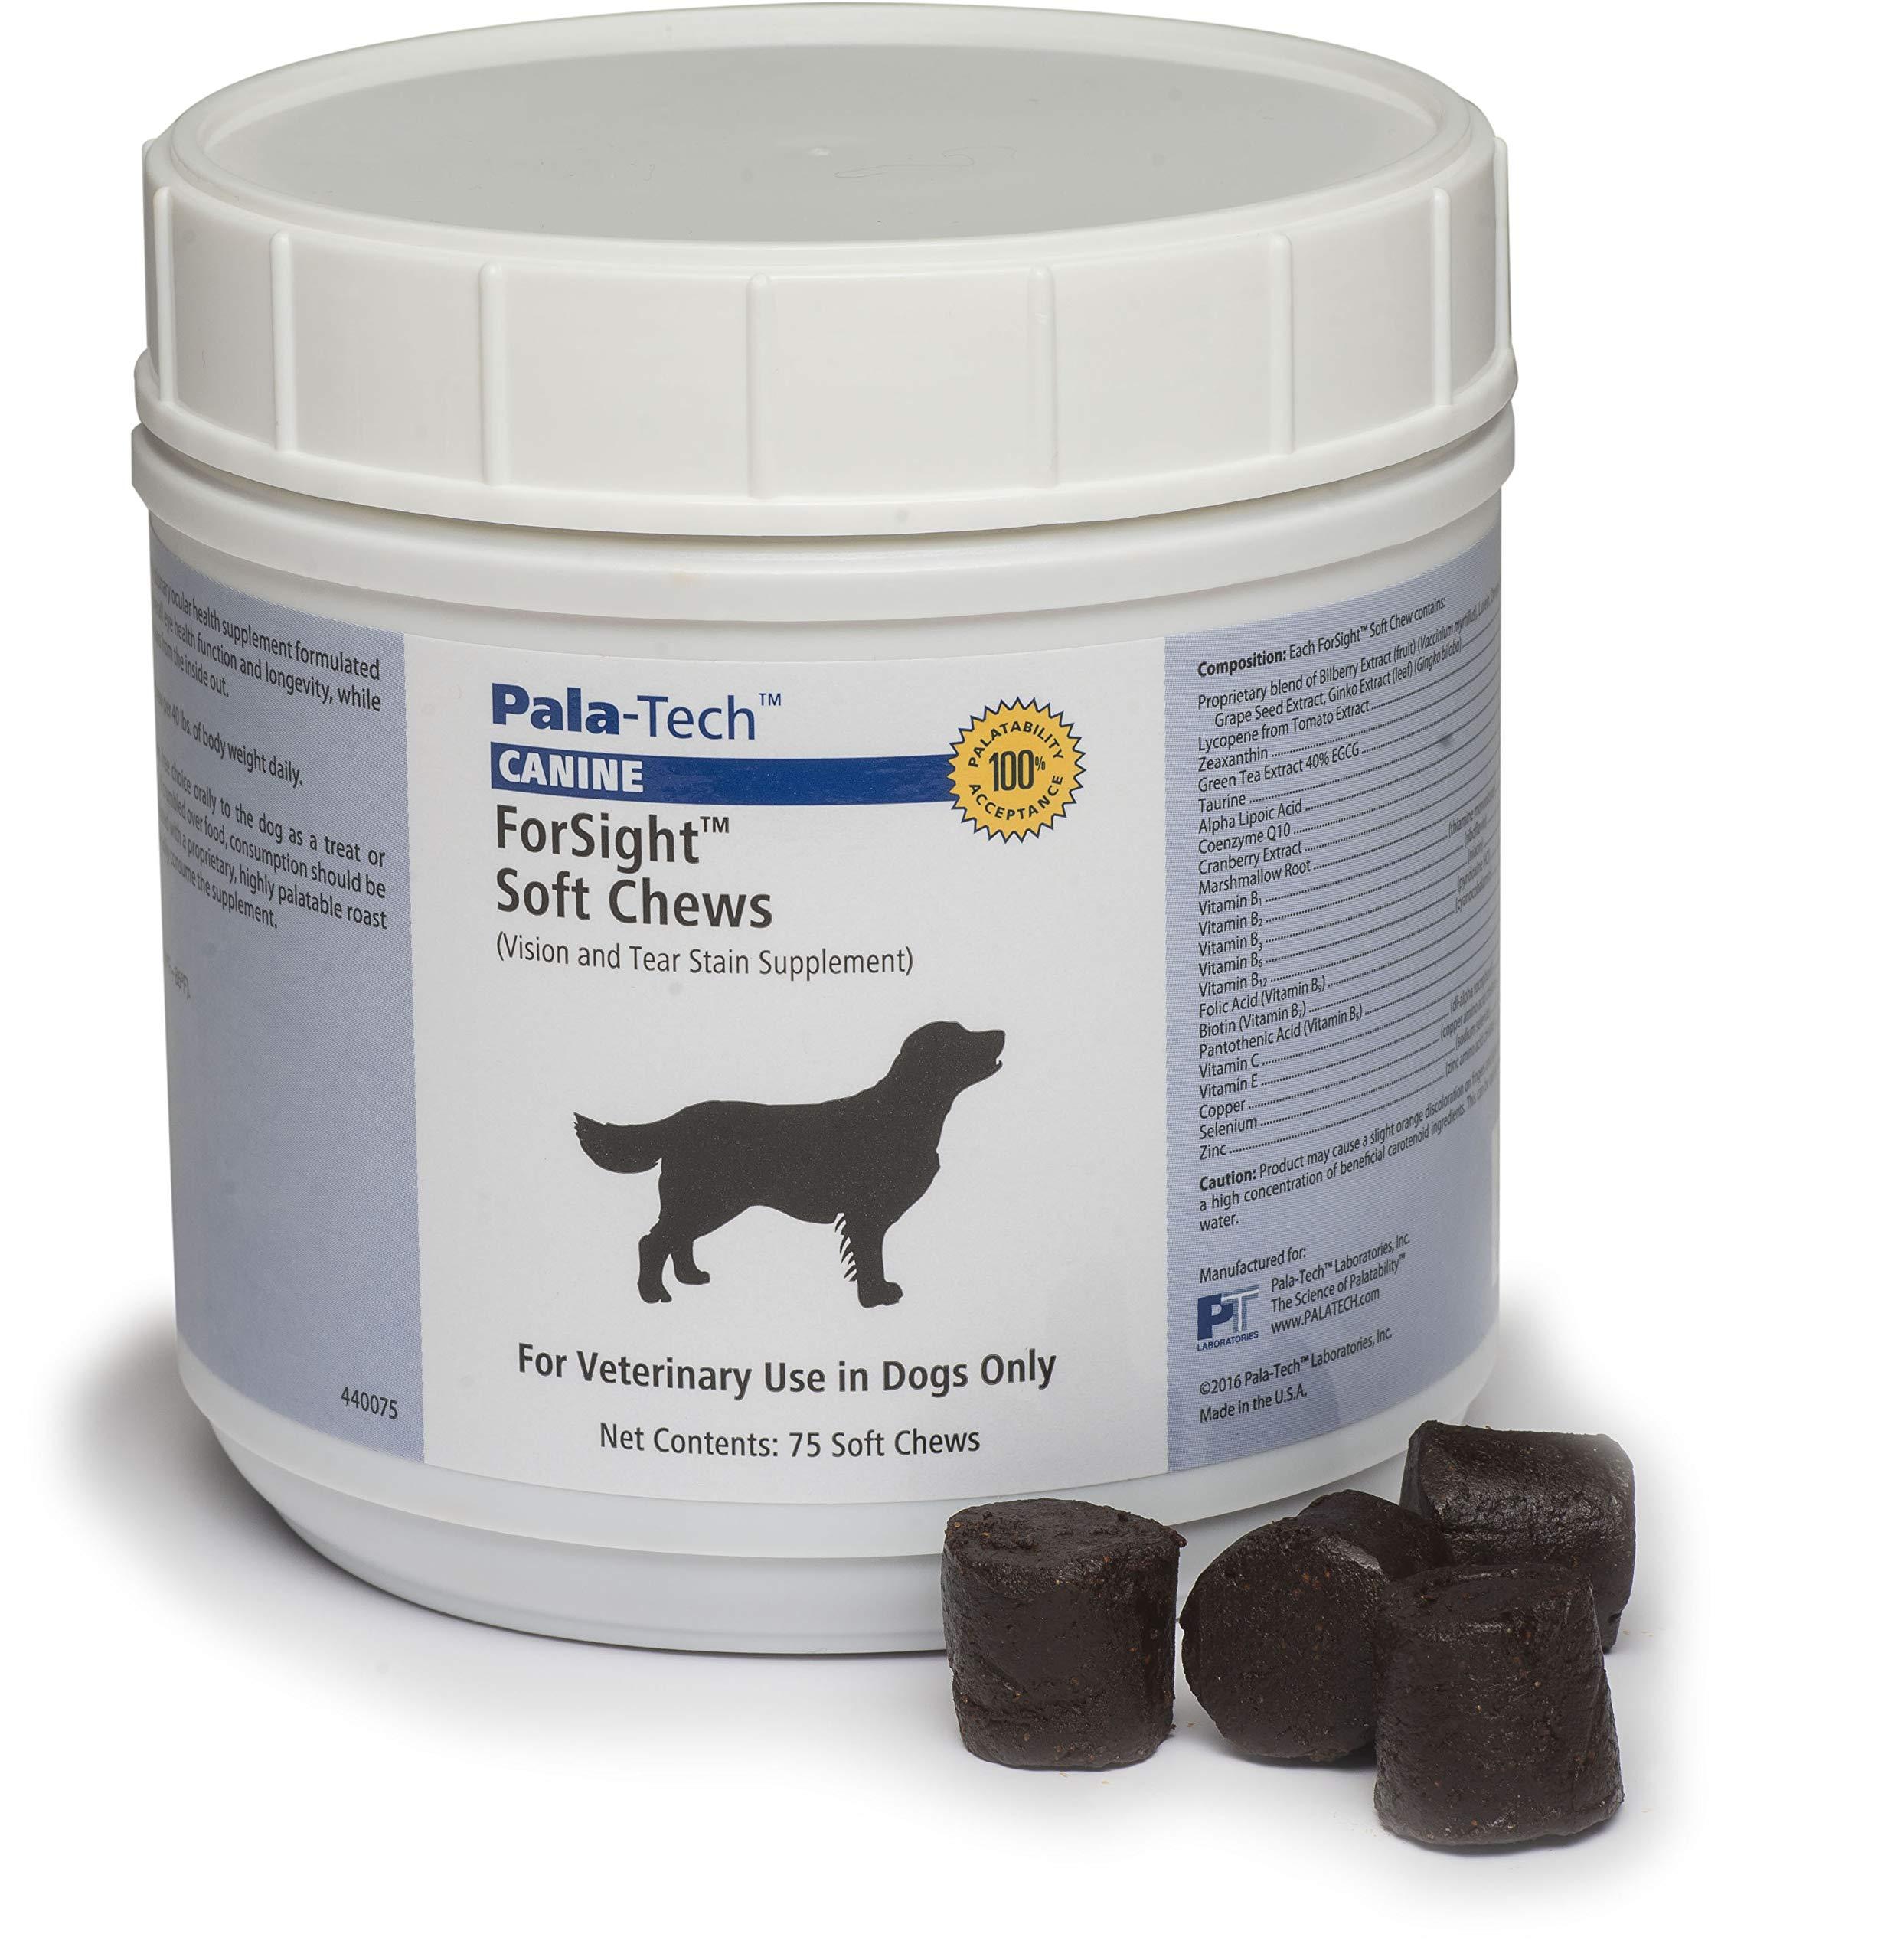 Pala Tech Canine Forsight Soft Chews by Pala Tech